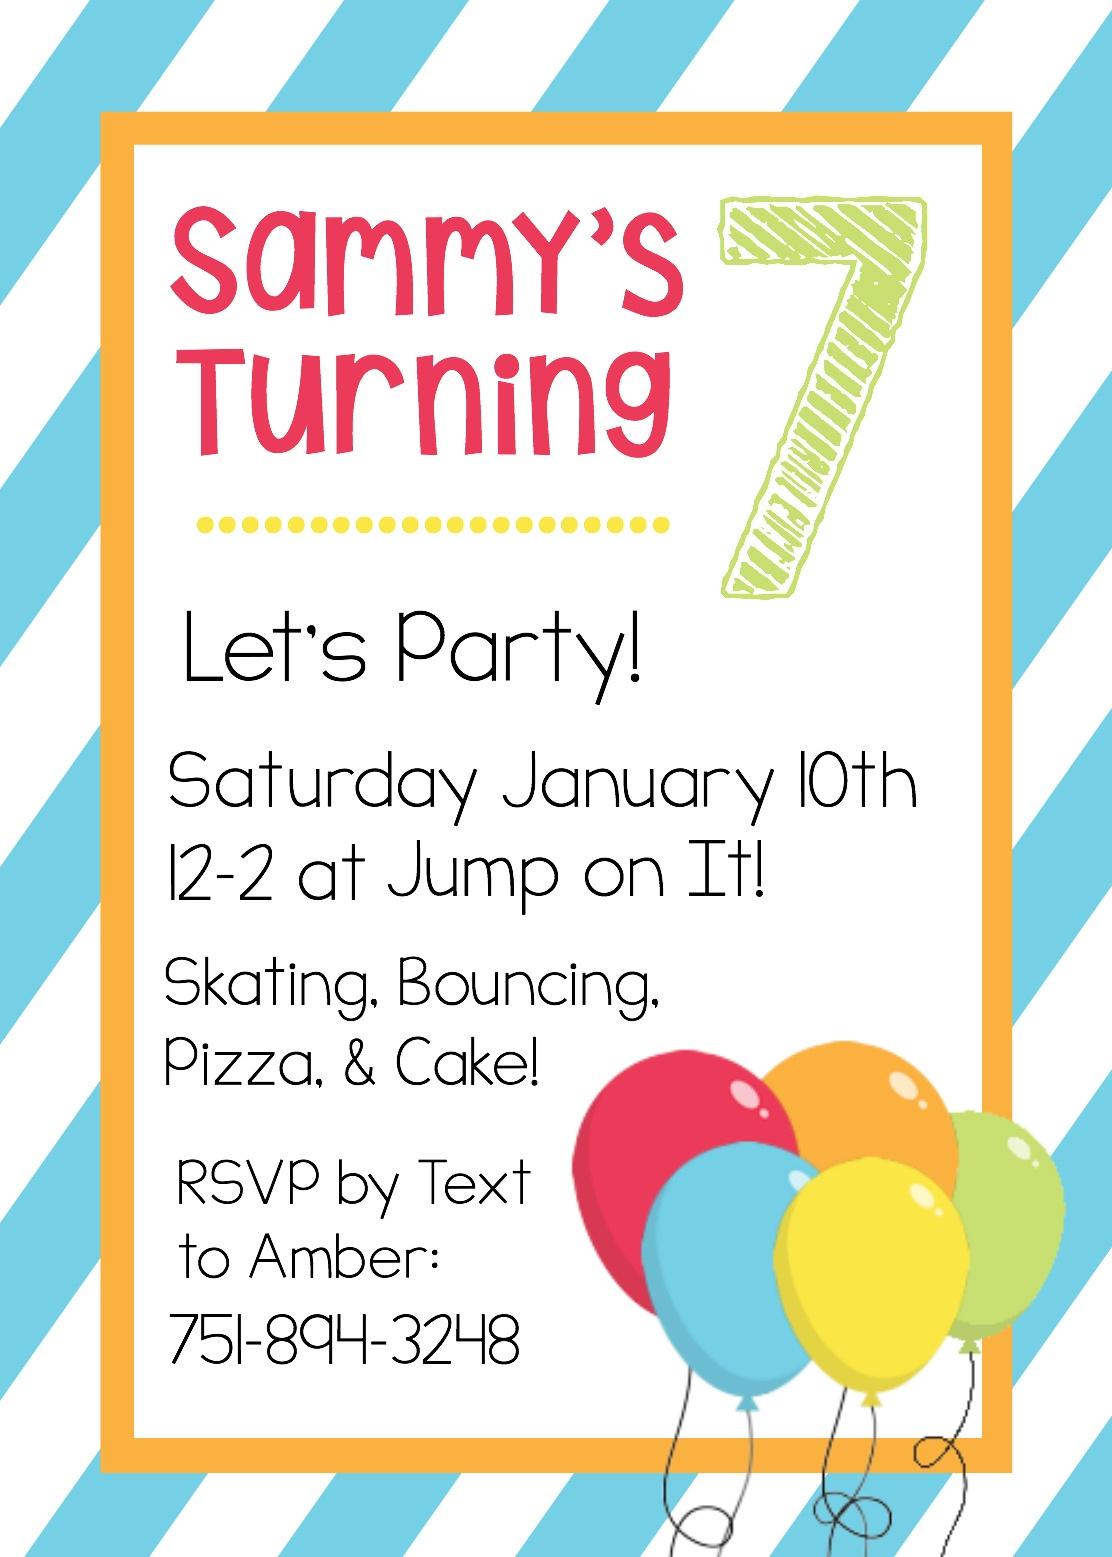 Free Printable Birthday Invitation Templates - Free Printable Birthday Invitation Cards Templates